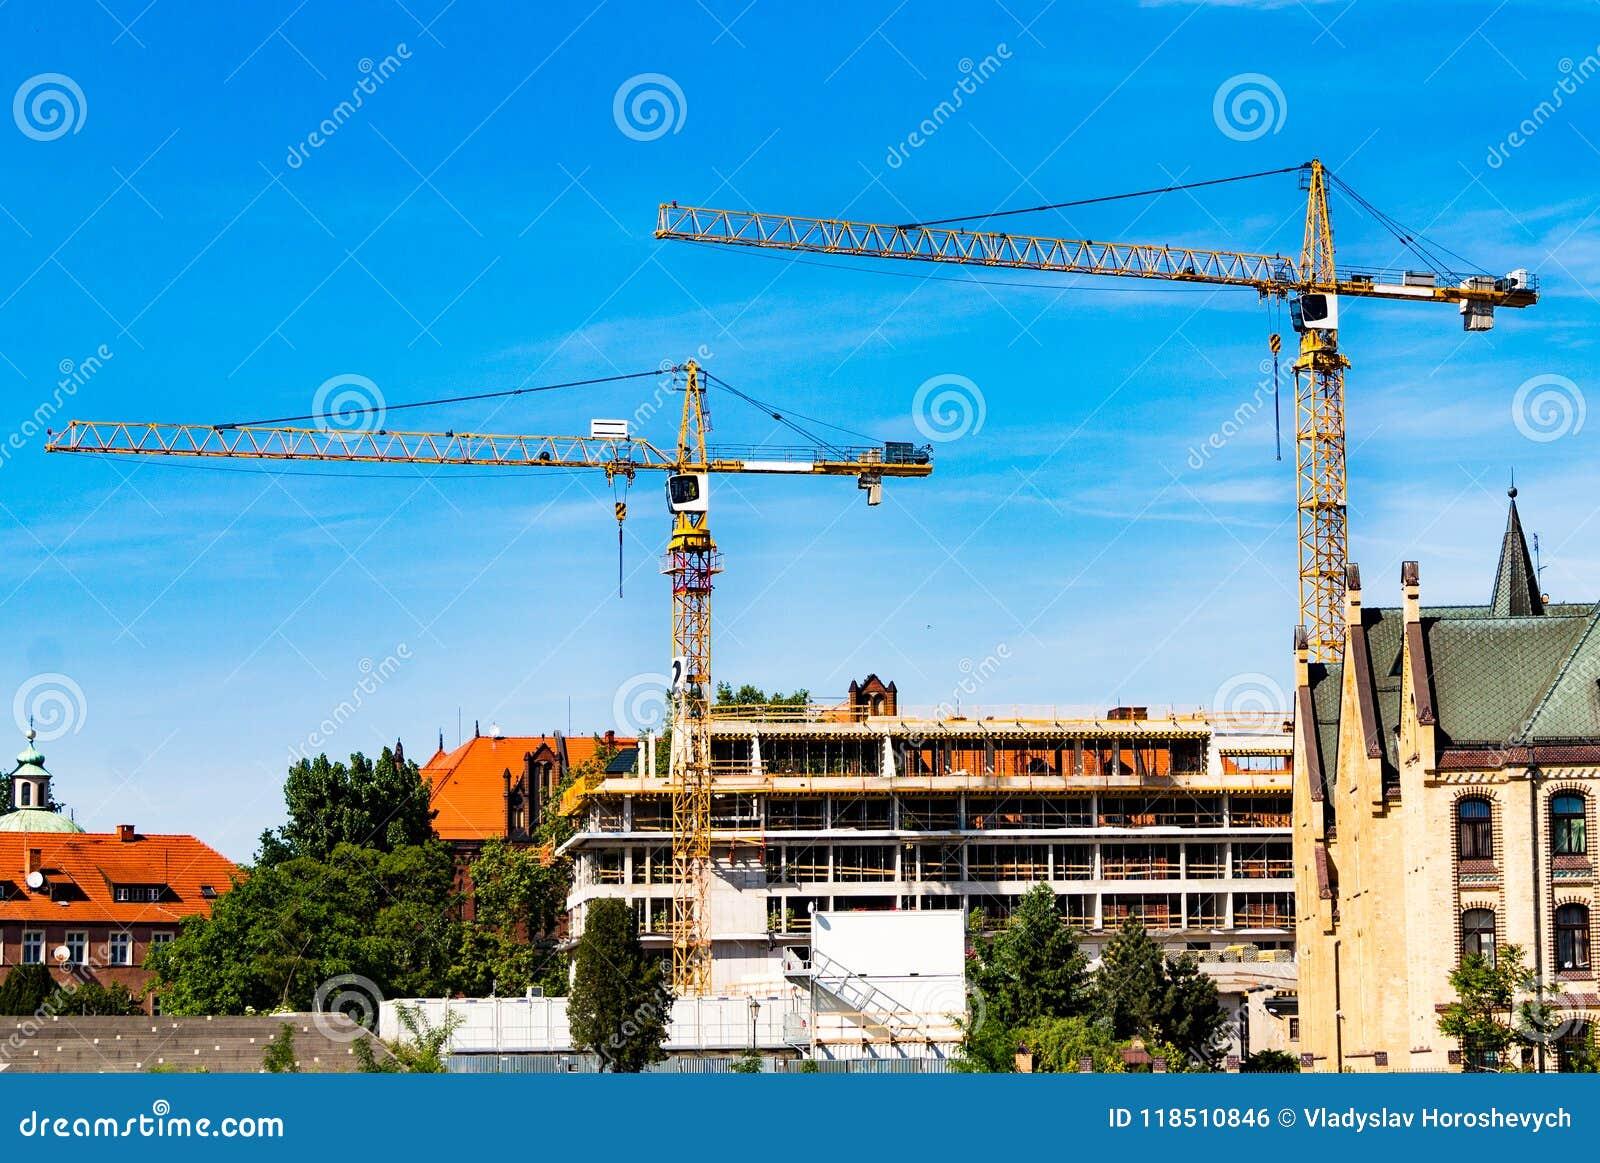 Tornkran, konstruktion av ett bostads- hus, en kran mot himlen, en motvikt, industriell horisont